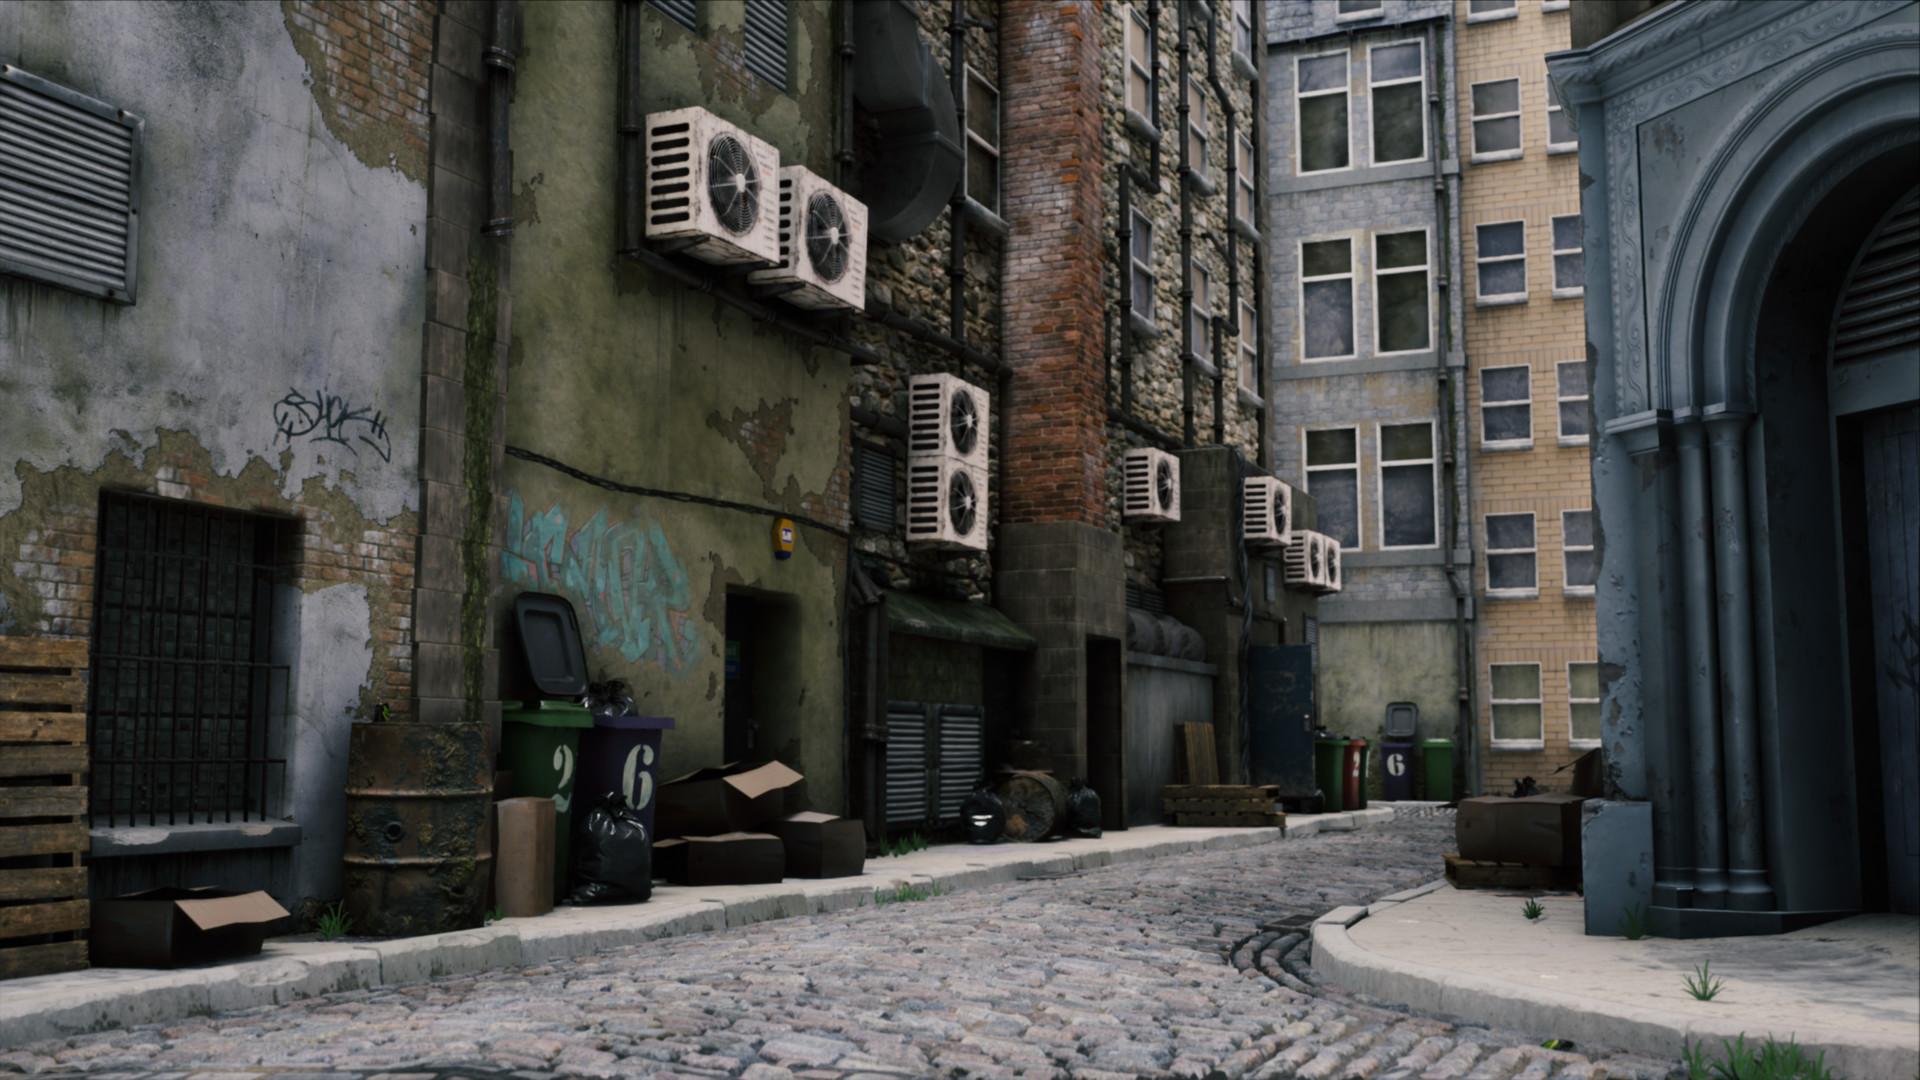 ArtStation - Dirty Alley, George Garton